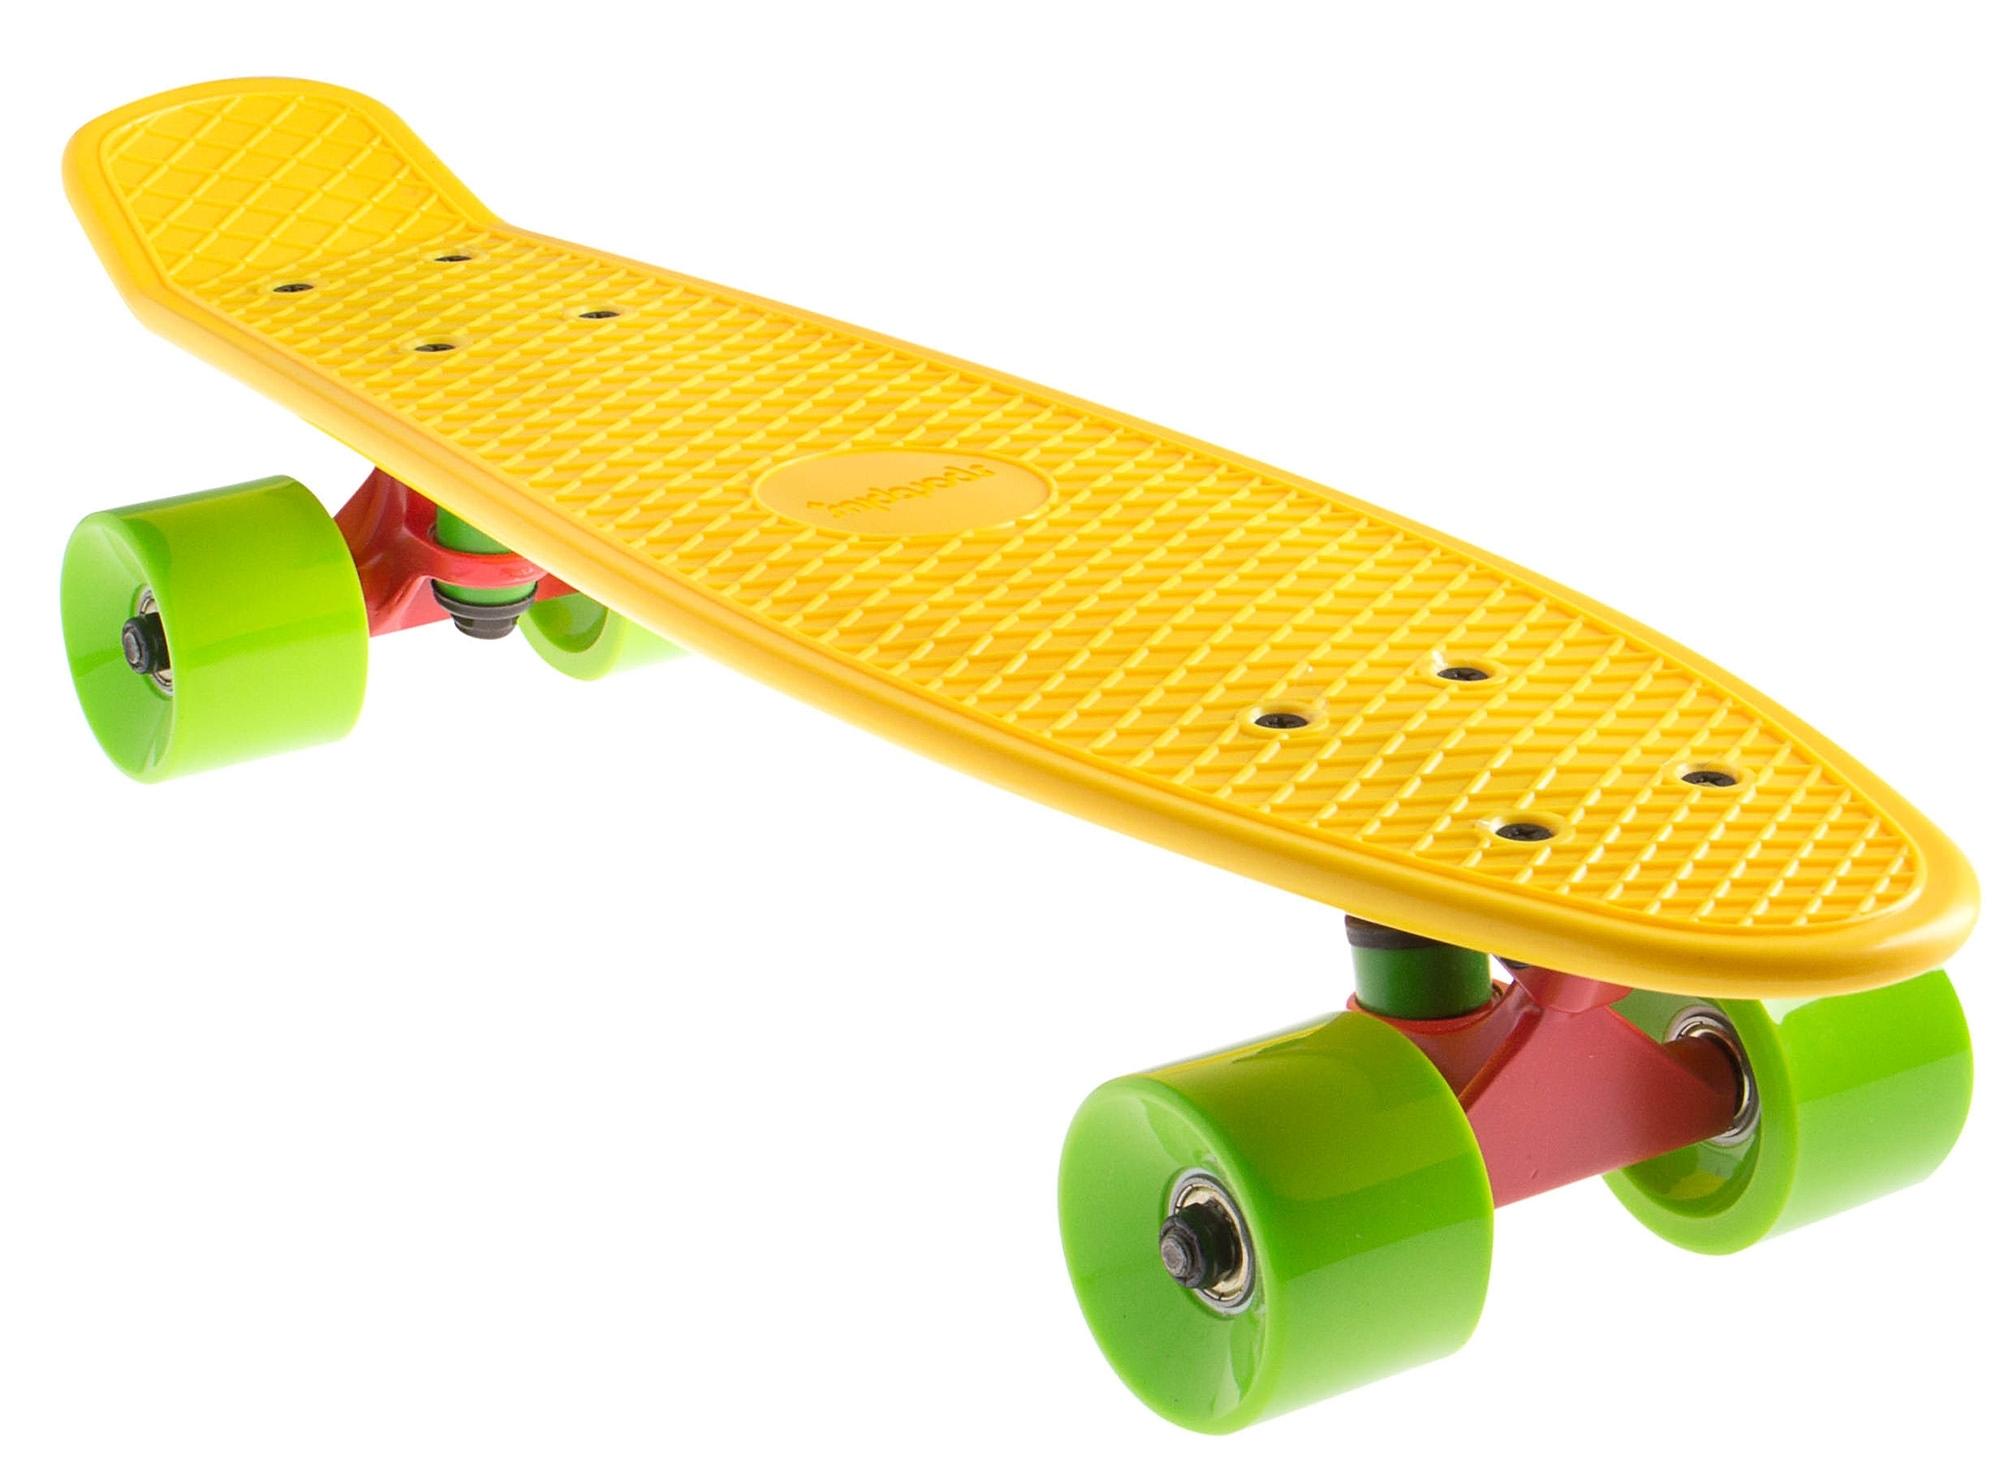 sportplus ezy mini cruiser mini skateboard yellow sp sb 305 online kopen otto. Black Bedroom Furniture Sets. Home Design Ideas